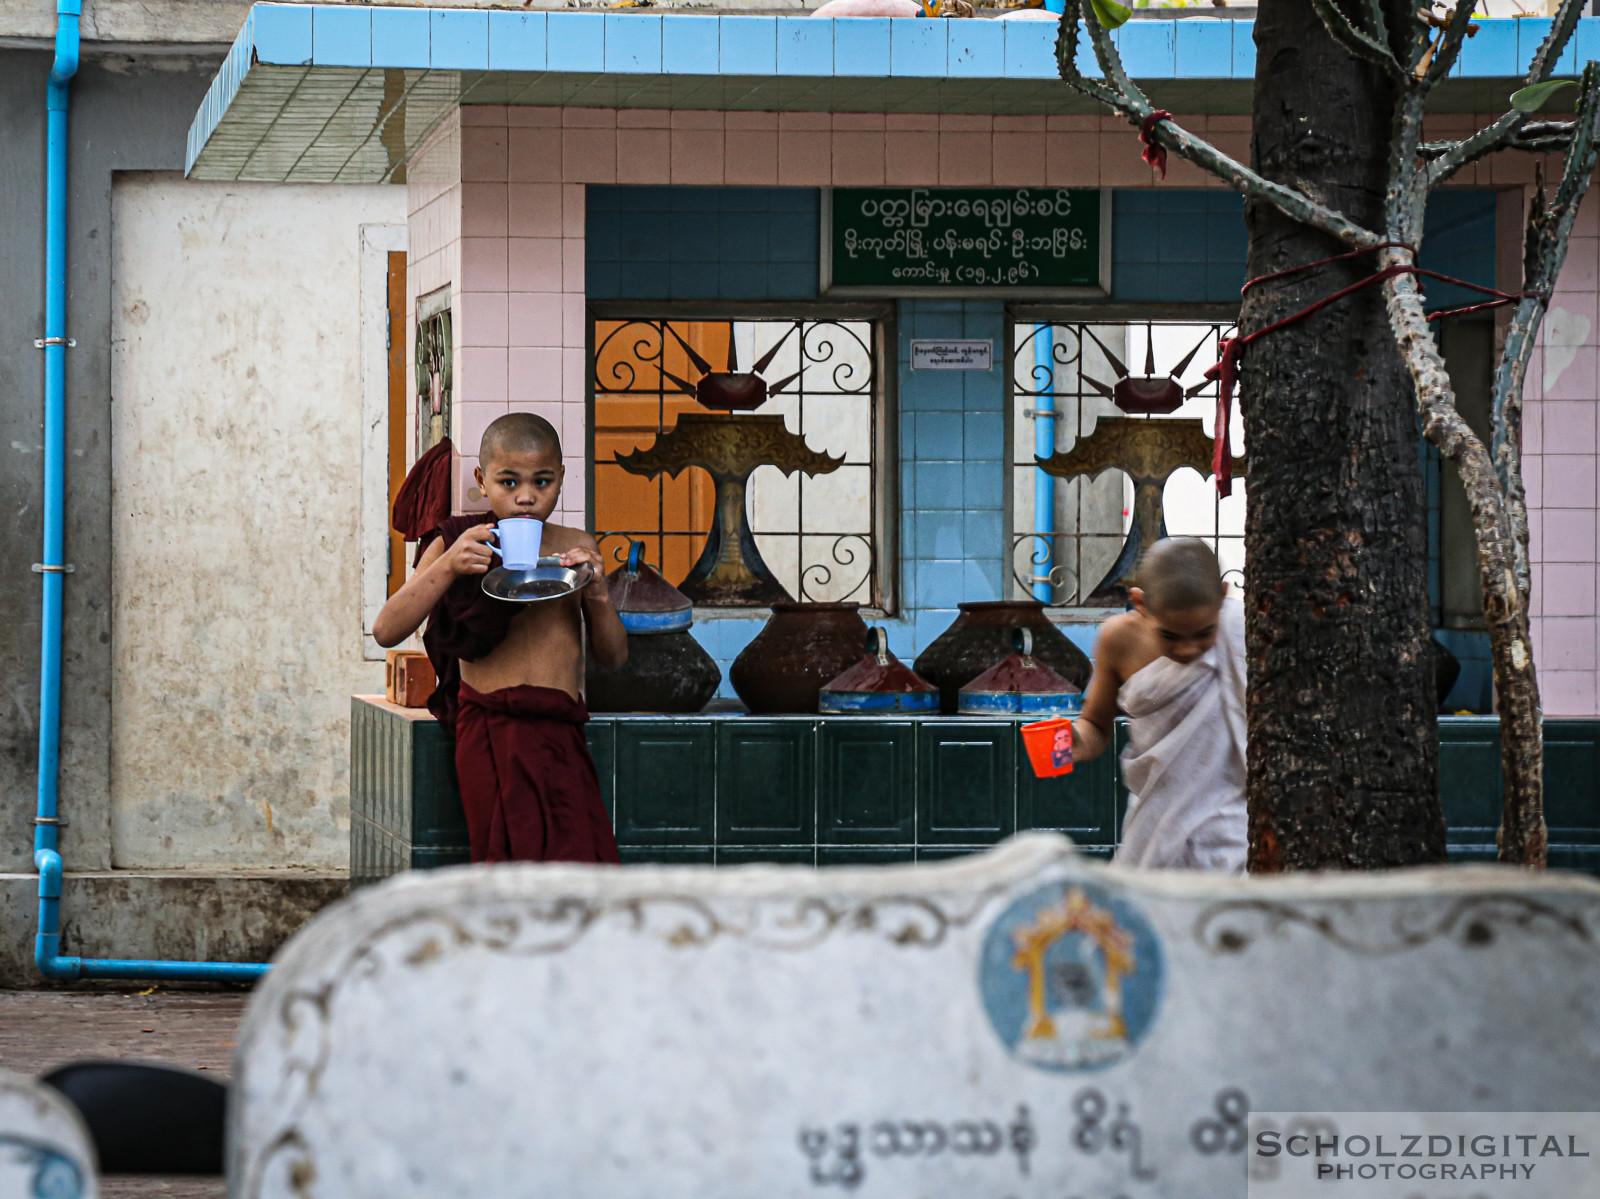 Monastery Primary School,Myanmar, Travelling,Asia, Bagan, Birma, Burma, Exploring, globetrotter, Irrawaddy, Mandalay, Southeastasia, Streetphotography, travel, Travelling, travelphotography, Wanderlust